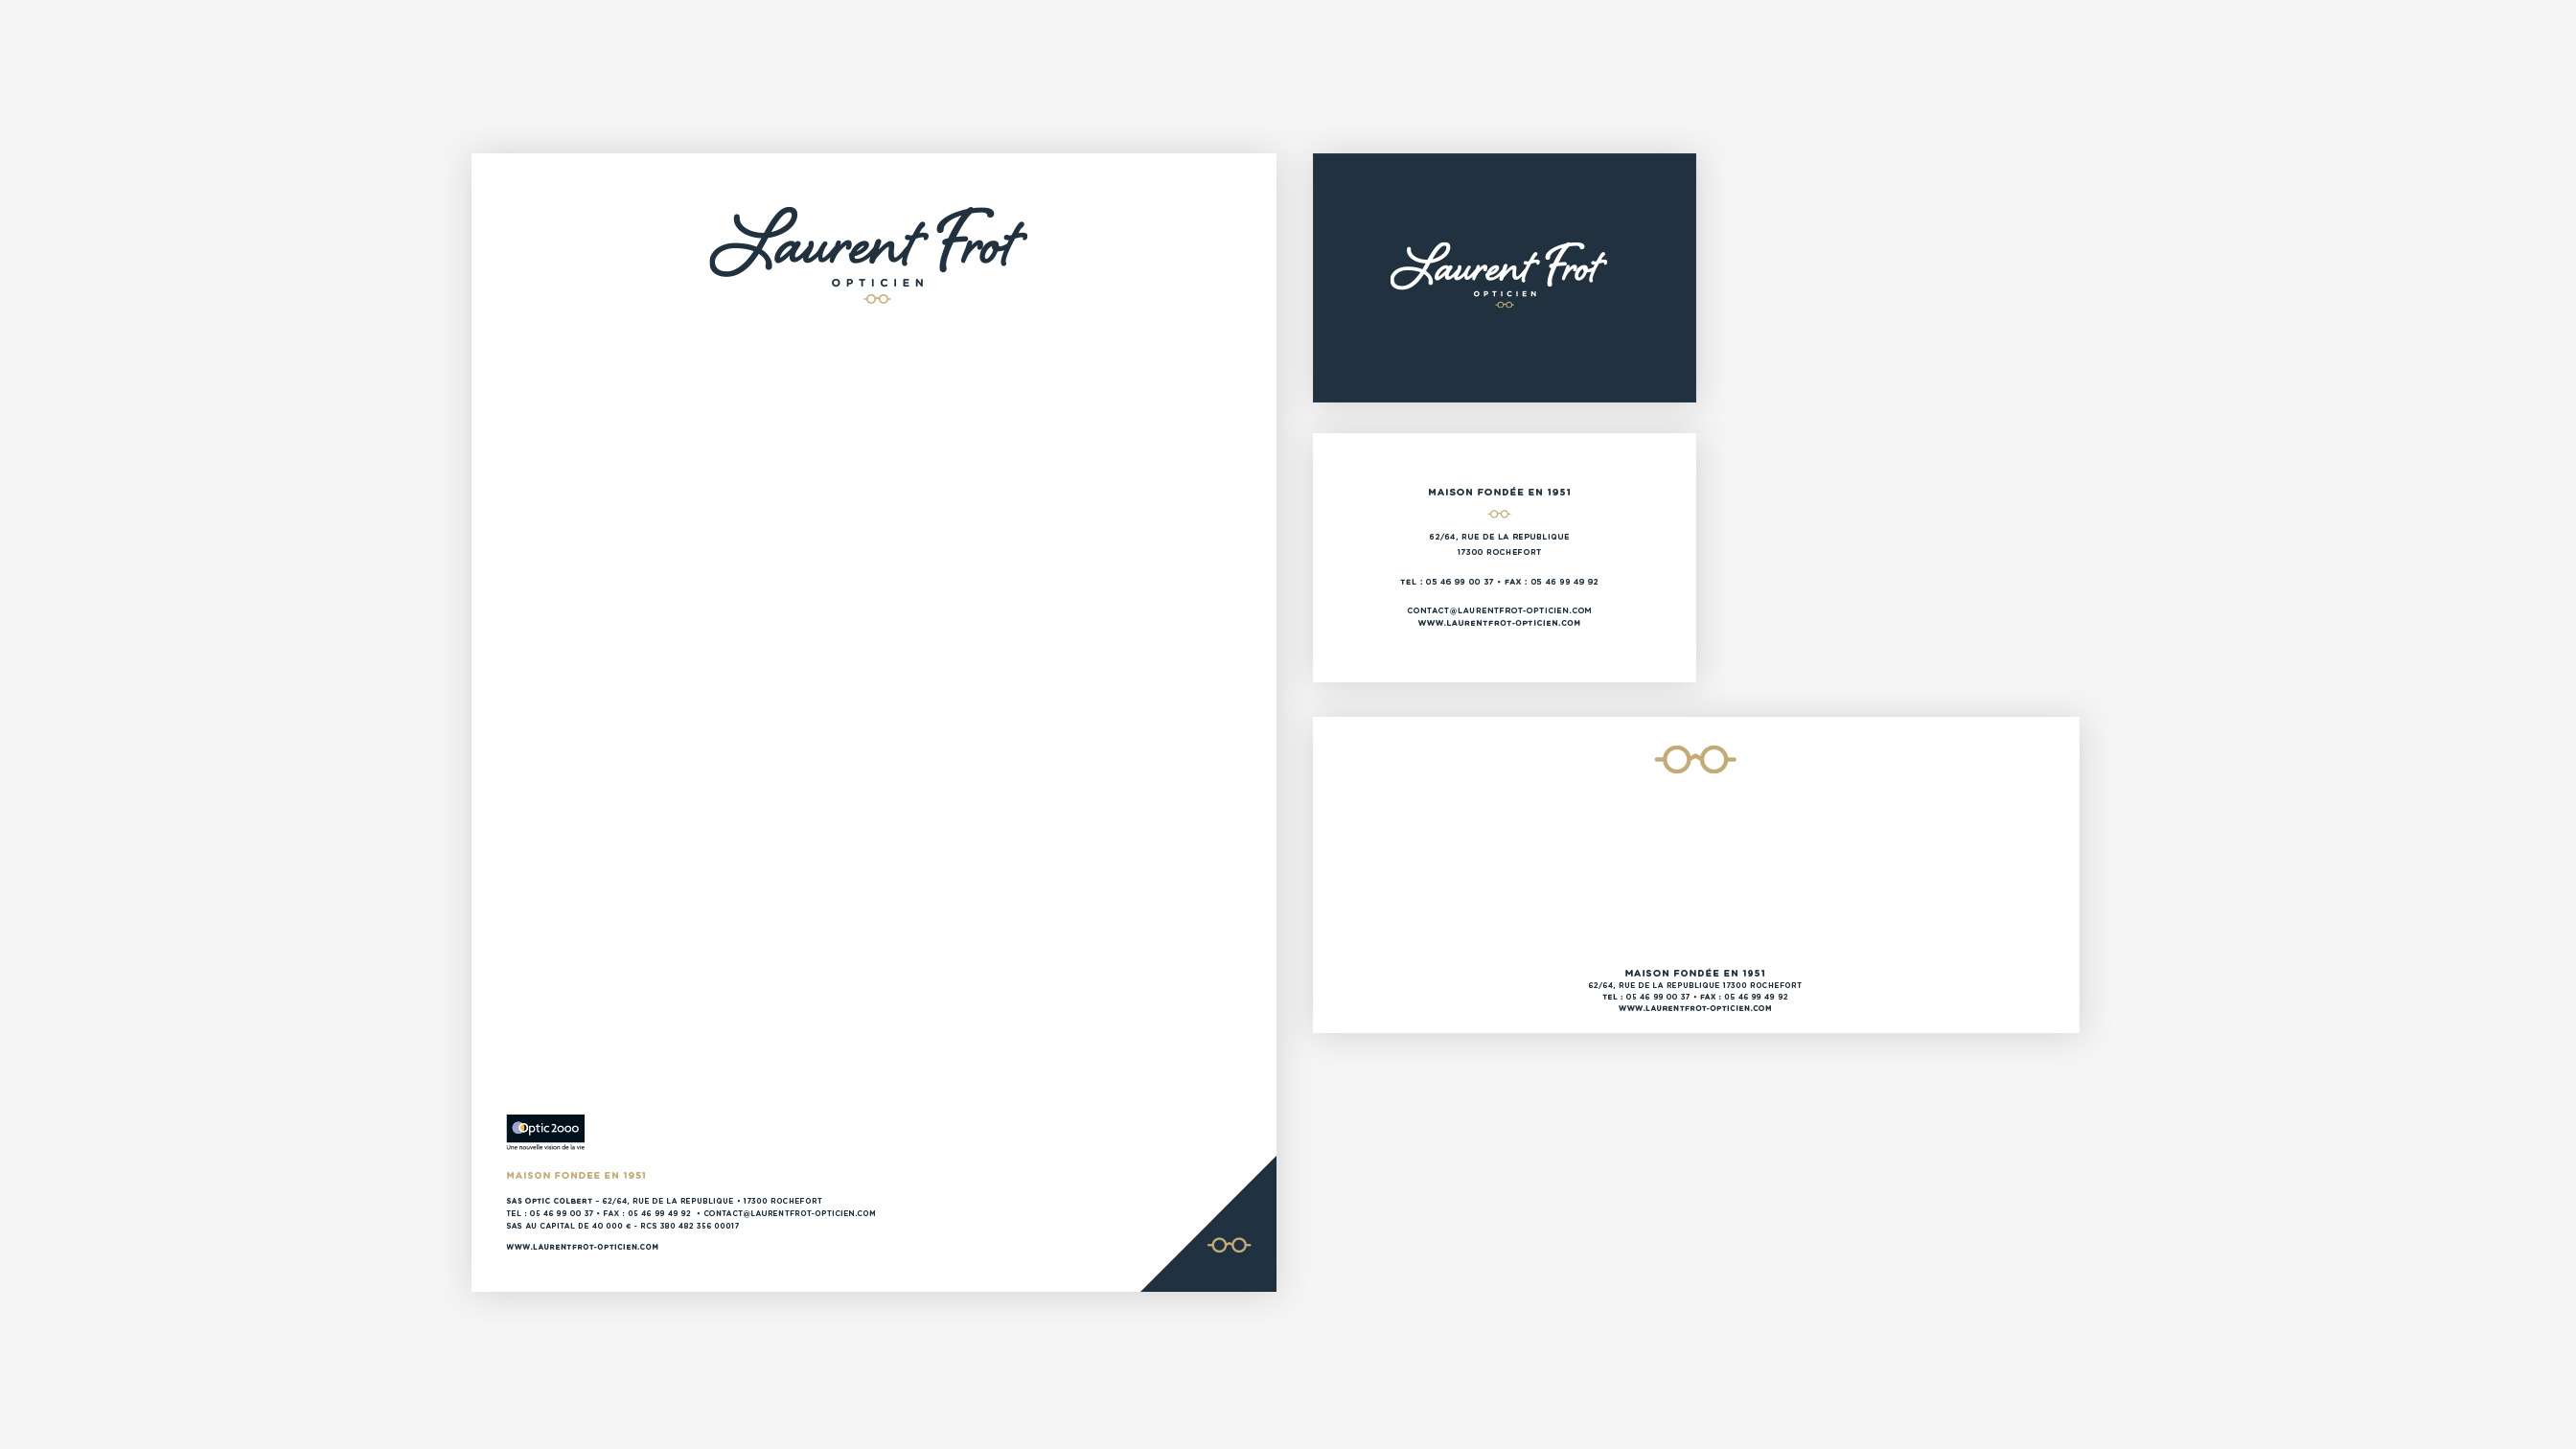 07-laurent-frot-opticien-pikteo-webdesign-graphic-design-freelance-paris-bruxelles-londres